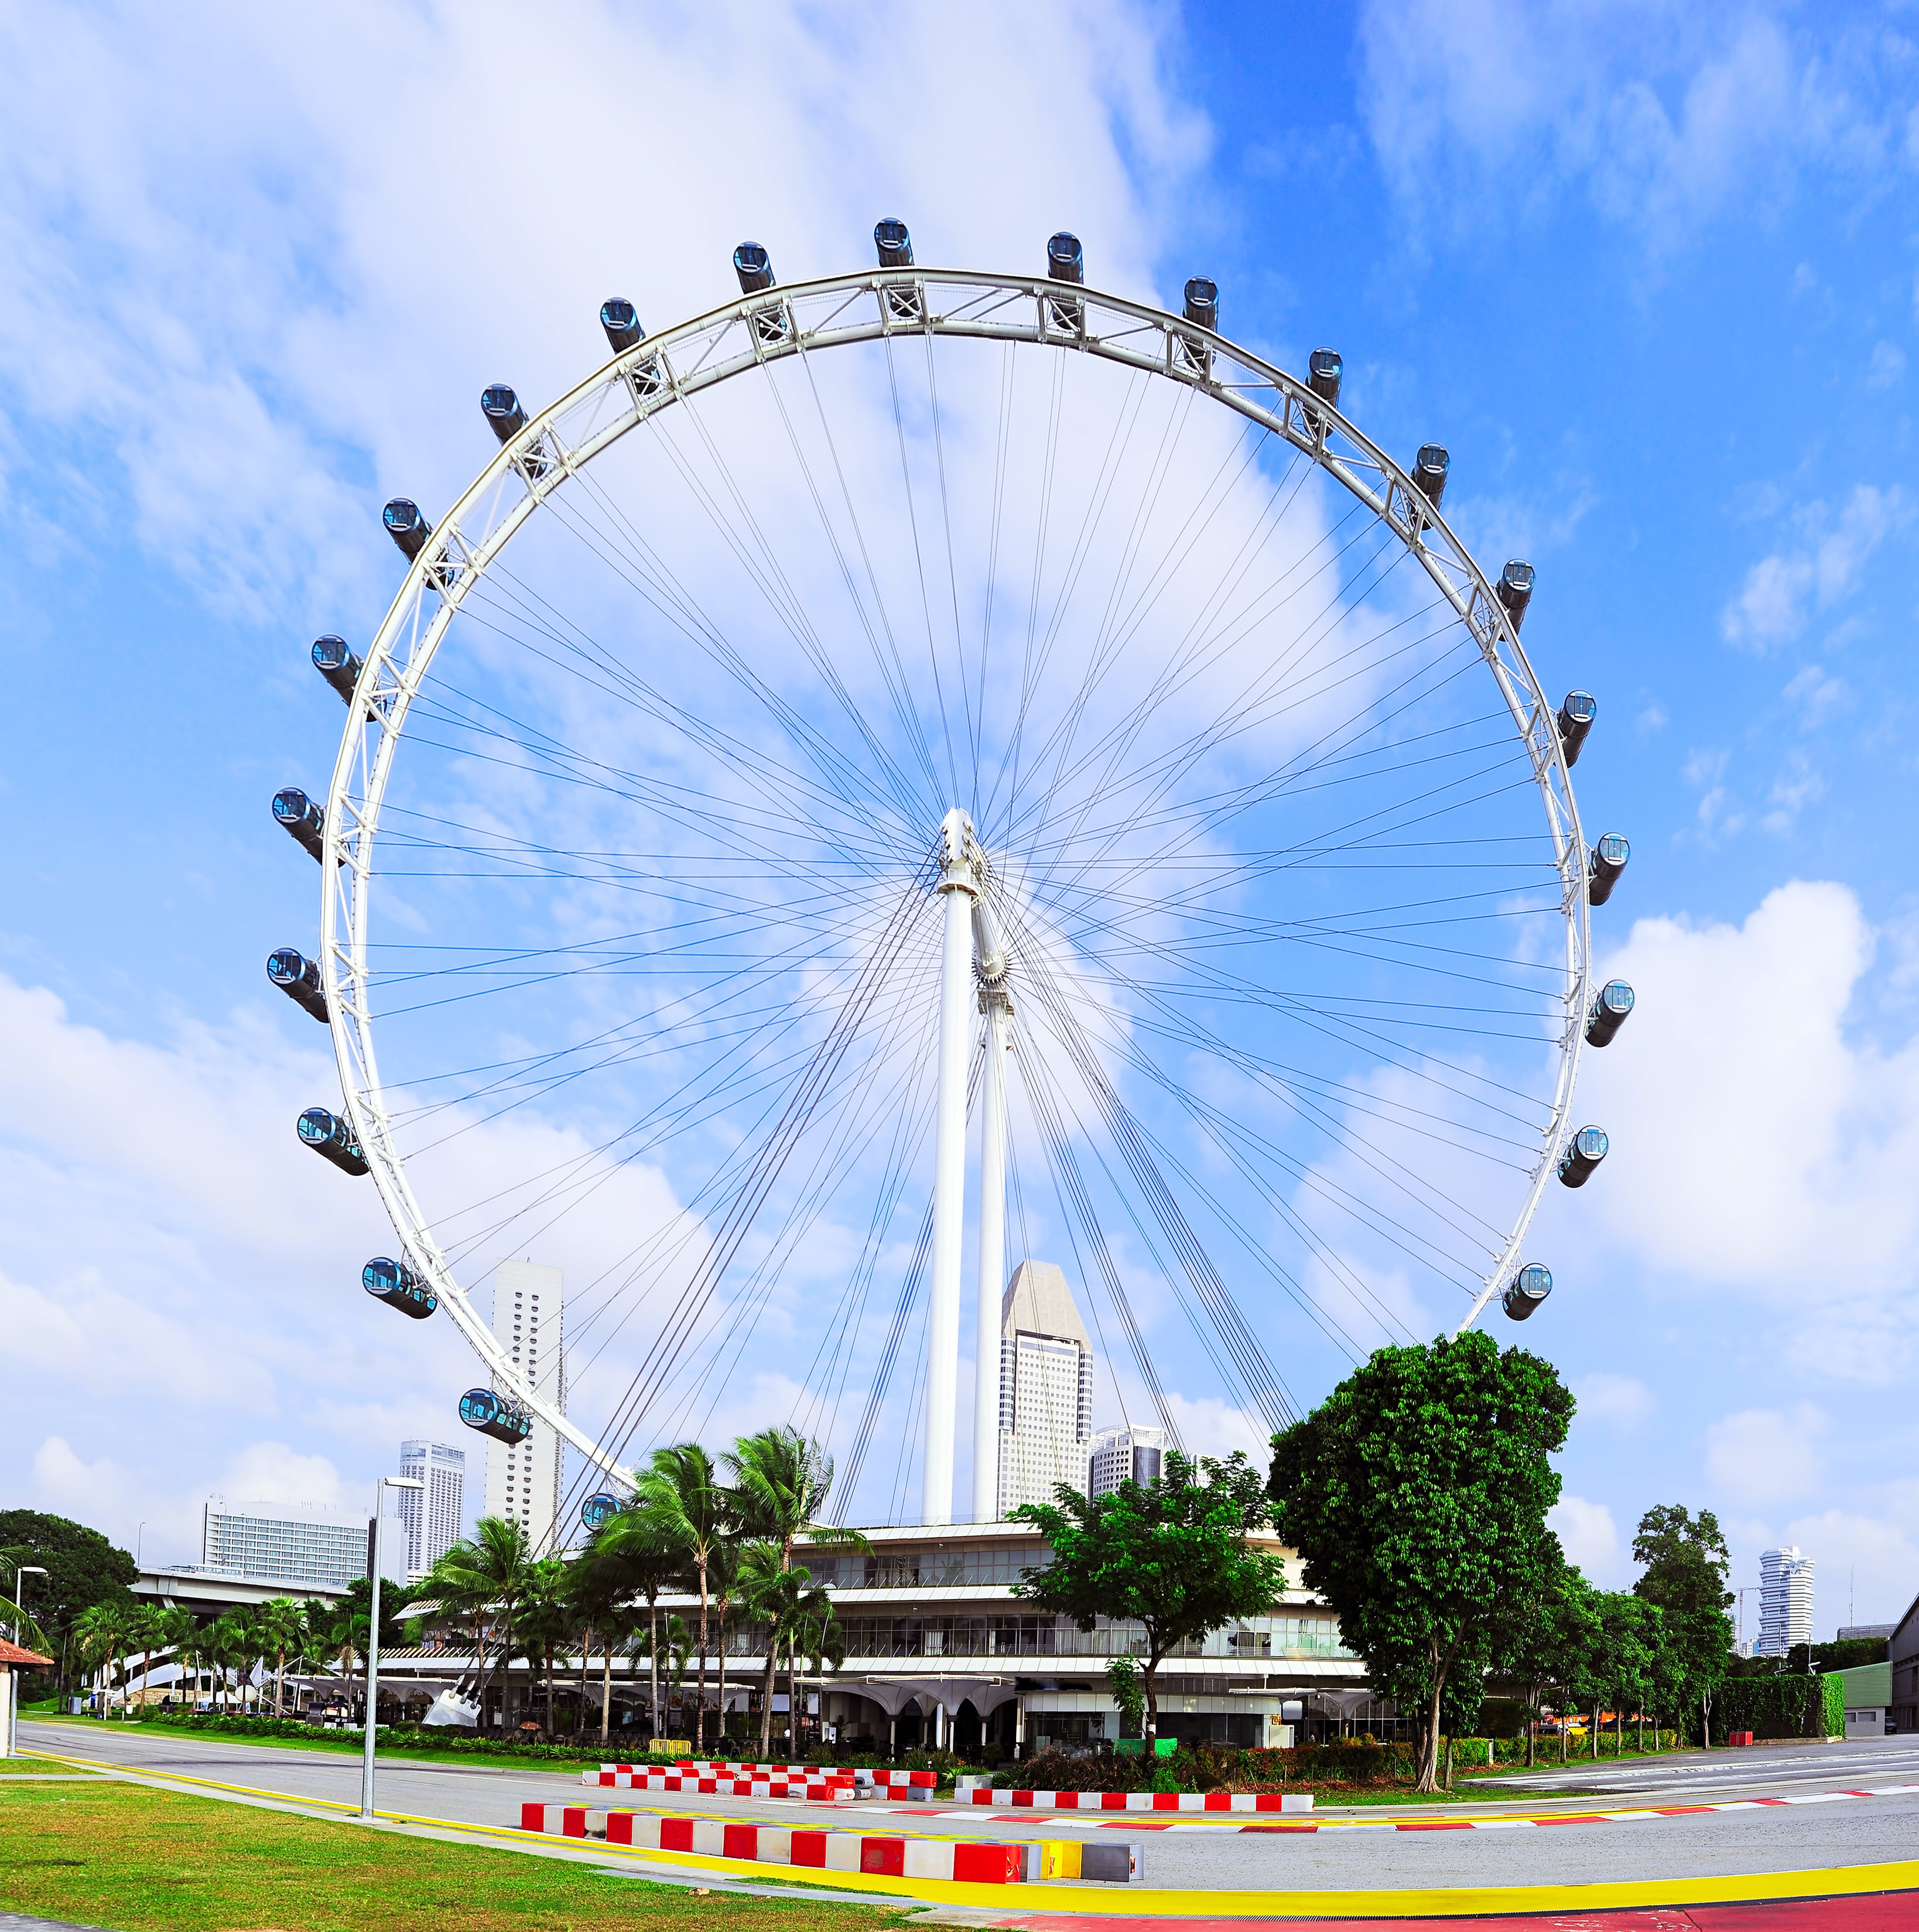 Top 4 Reasons to Visit Singapore